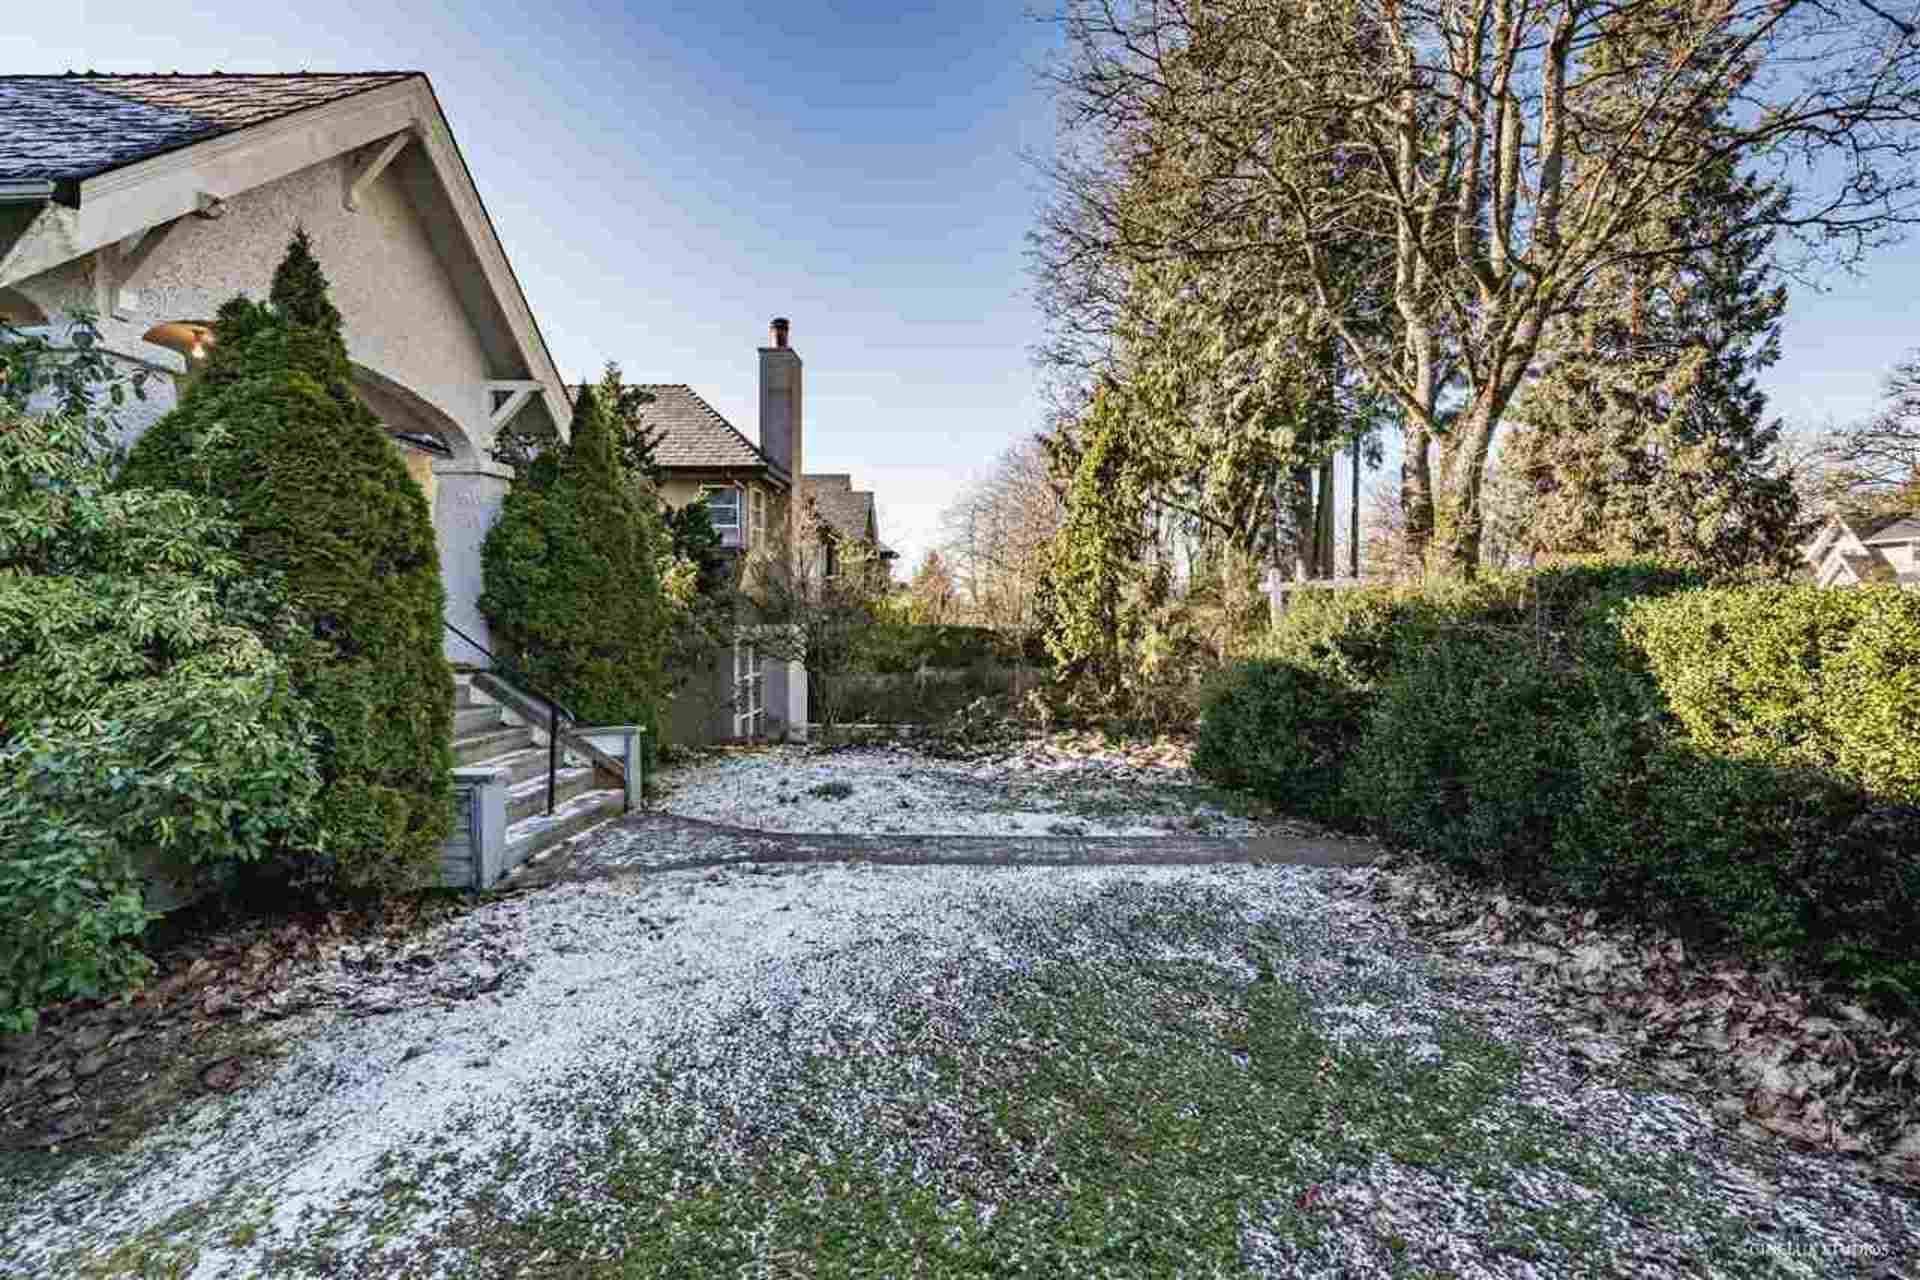 3804-w-king-edward-avenue-dunbar-vancouver-west-03 at 3804 W King Edward Avenue, Dunbar, Vancouver West